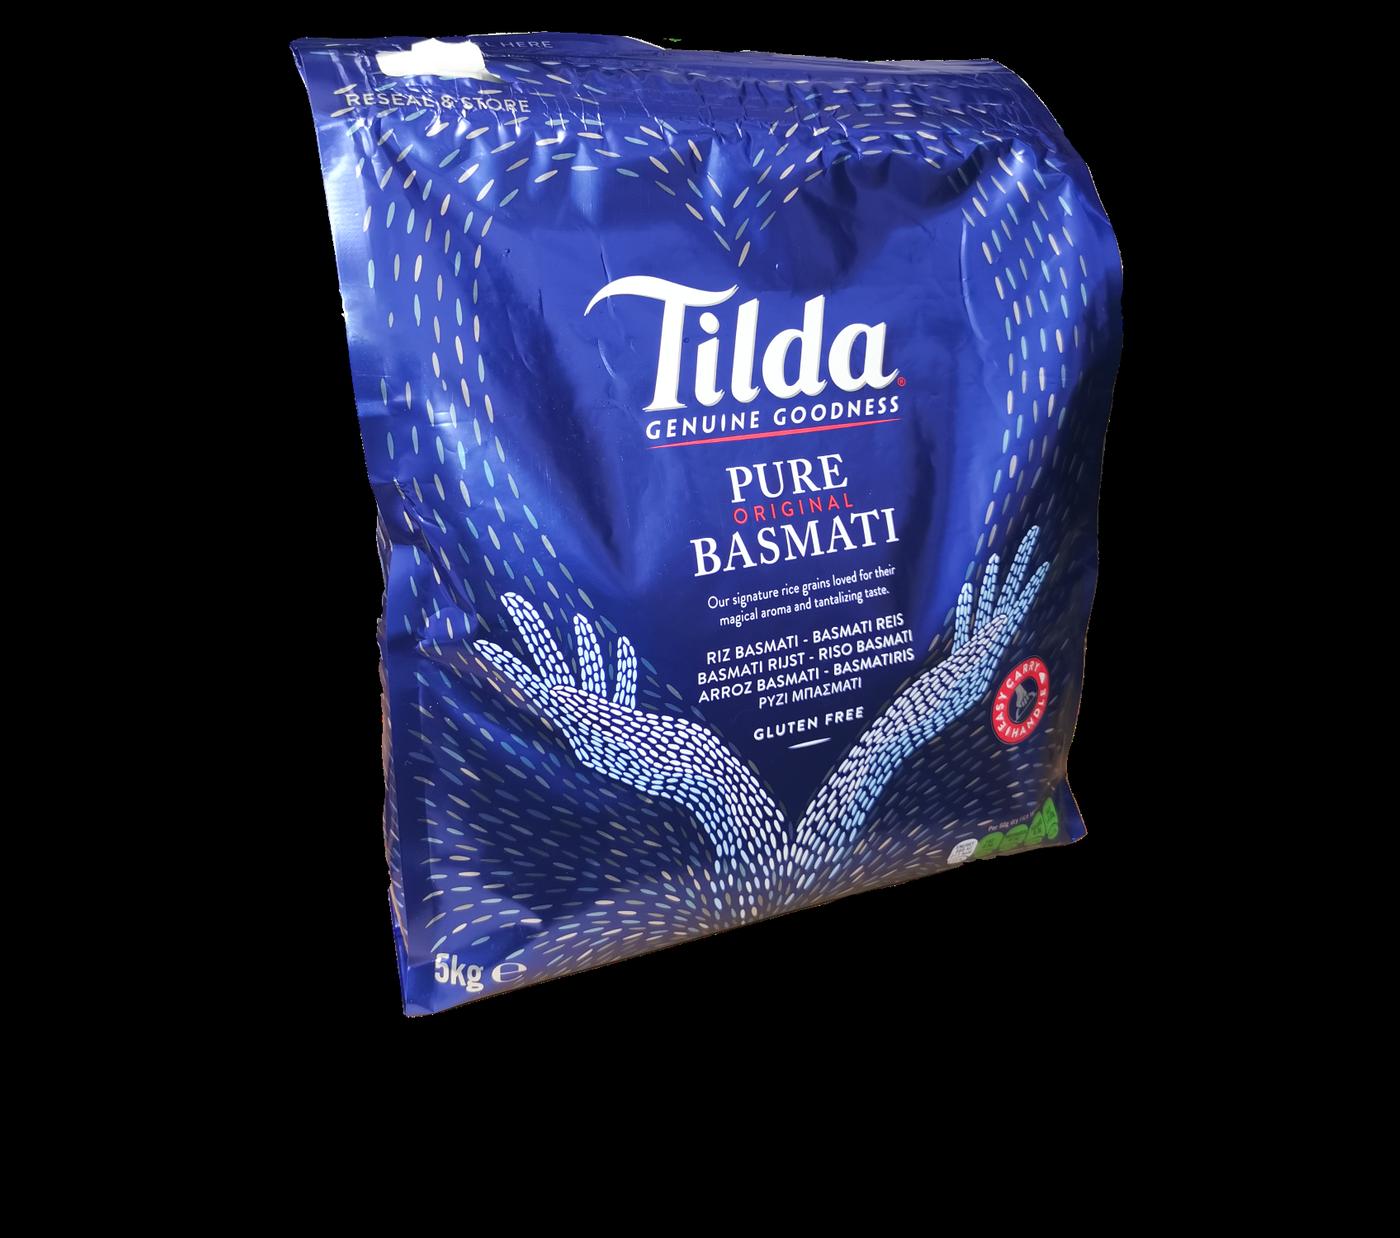 Tilda Pure Original Basmati